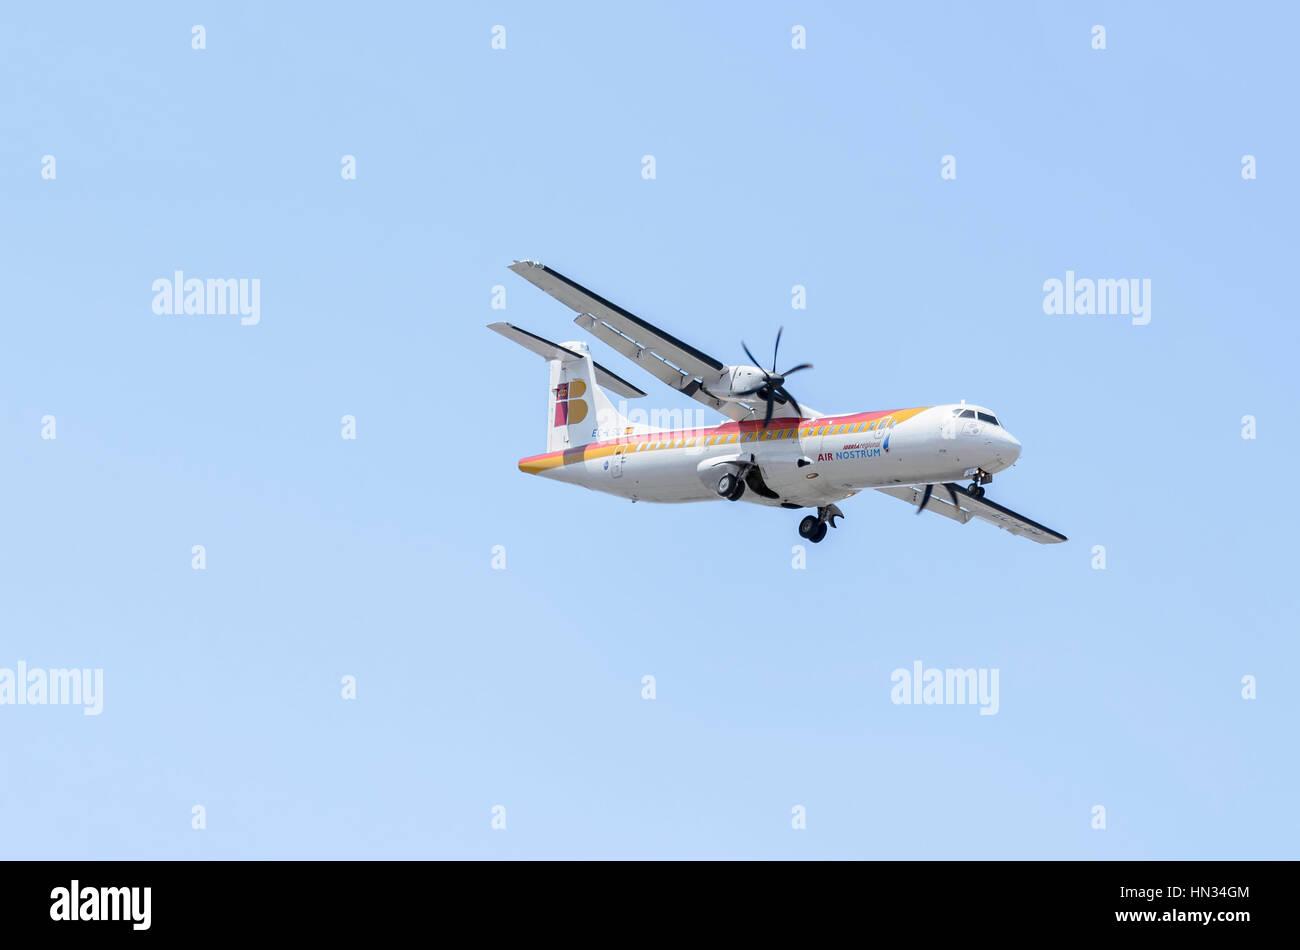 Plane ATR 72 600, of Air Nostrum airline. Iberia regional travels. Blue sky. Sunny day of spring. - Stock Image